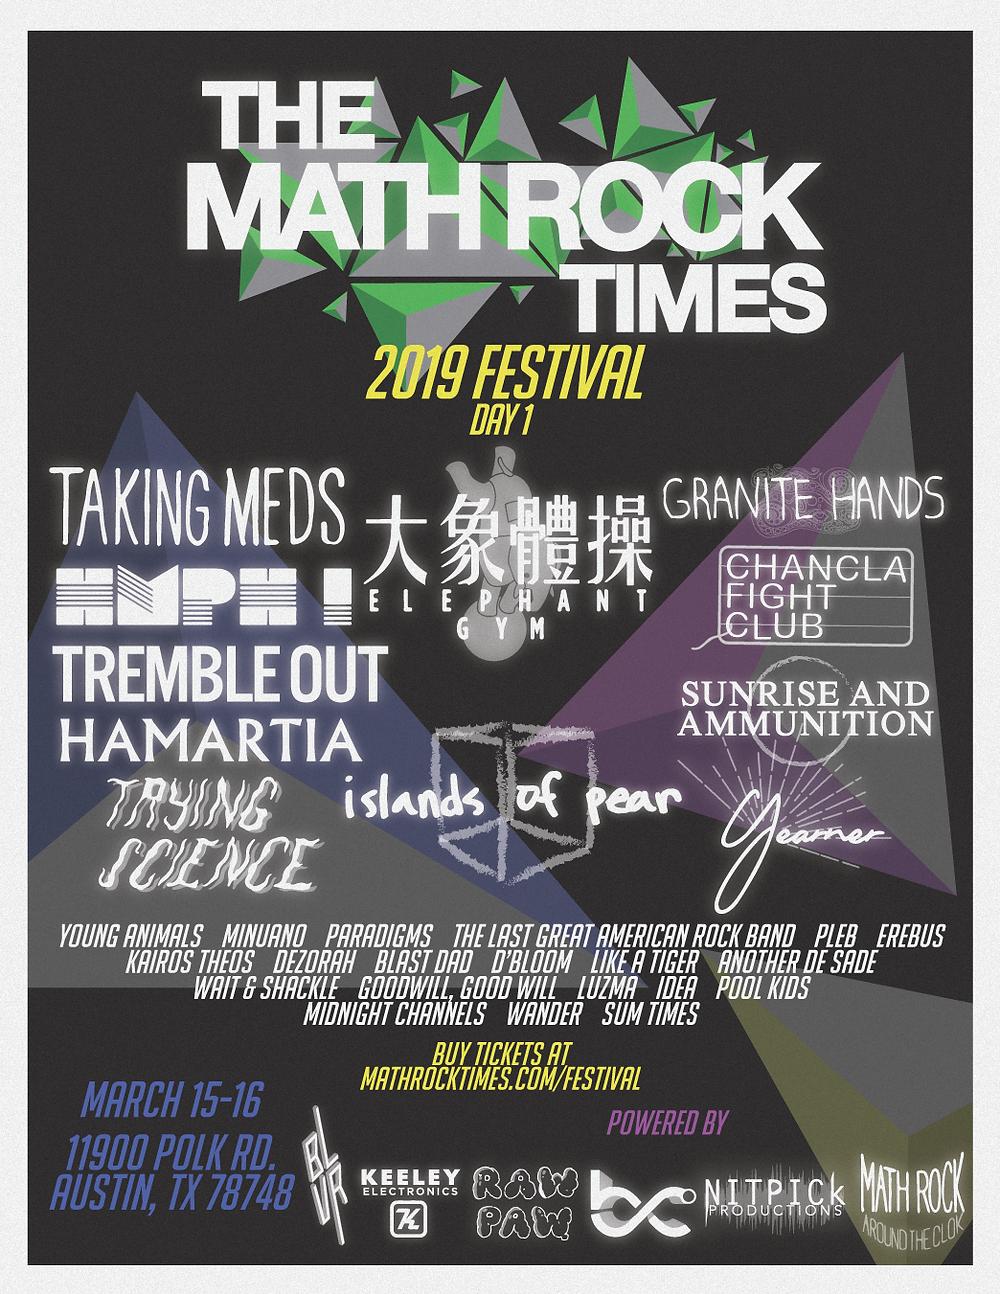 THE MATH ROCK TIMES FEST 2019